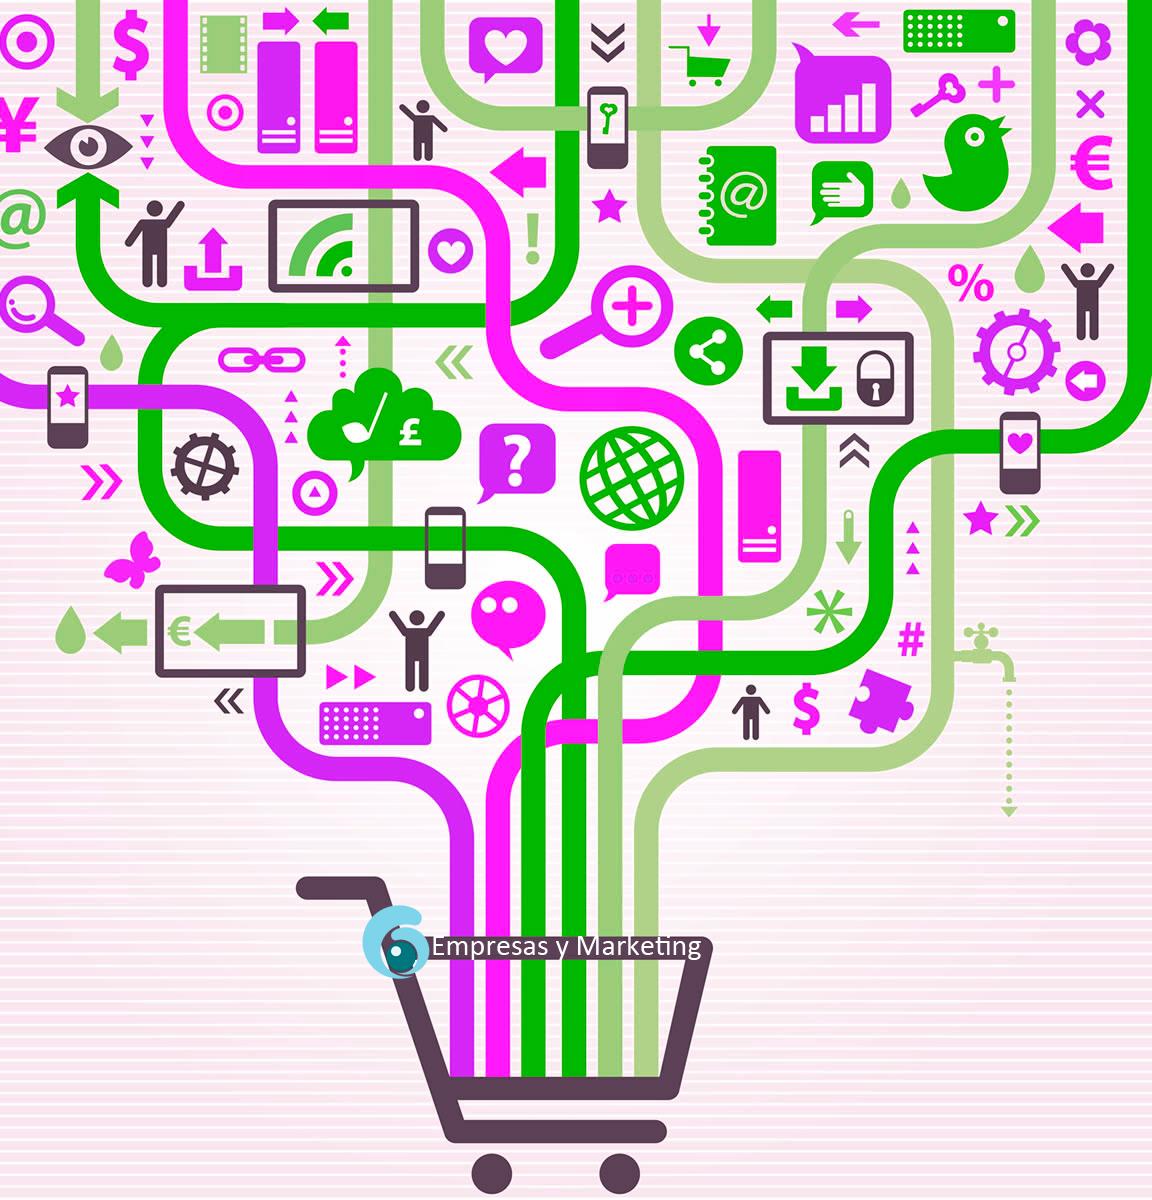 Zentrada plataforma digital b2b